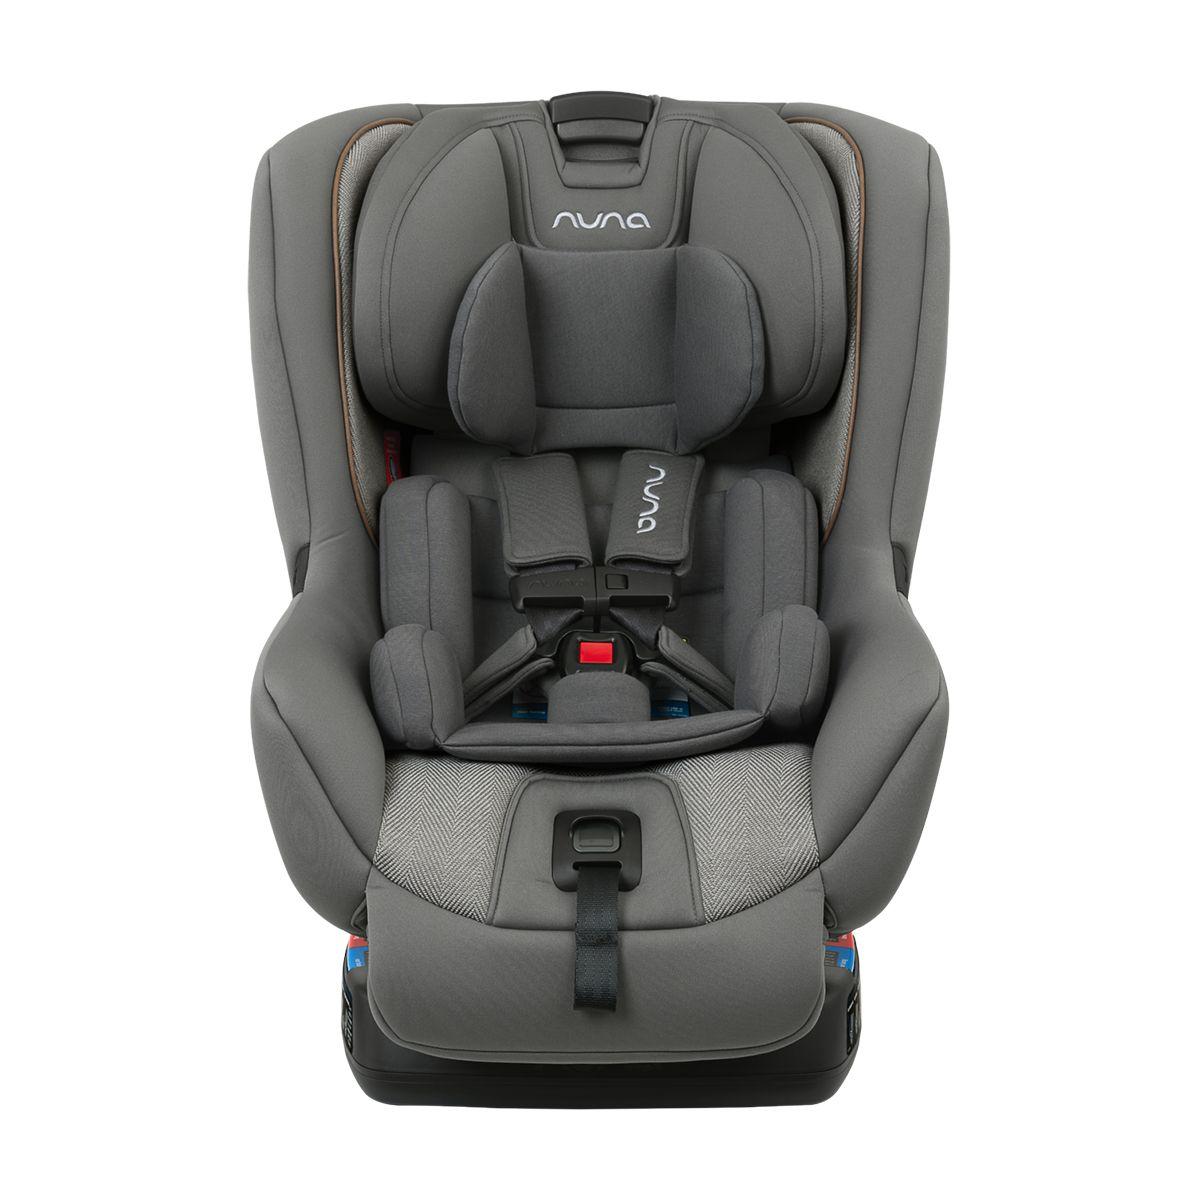 Nuna Rava Convertible Car Seat in 2020 Best convertible